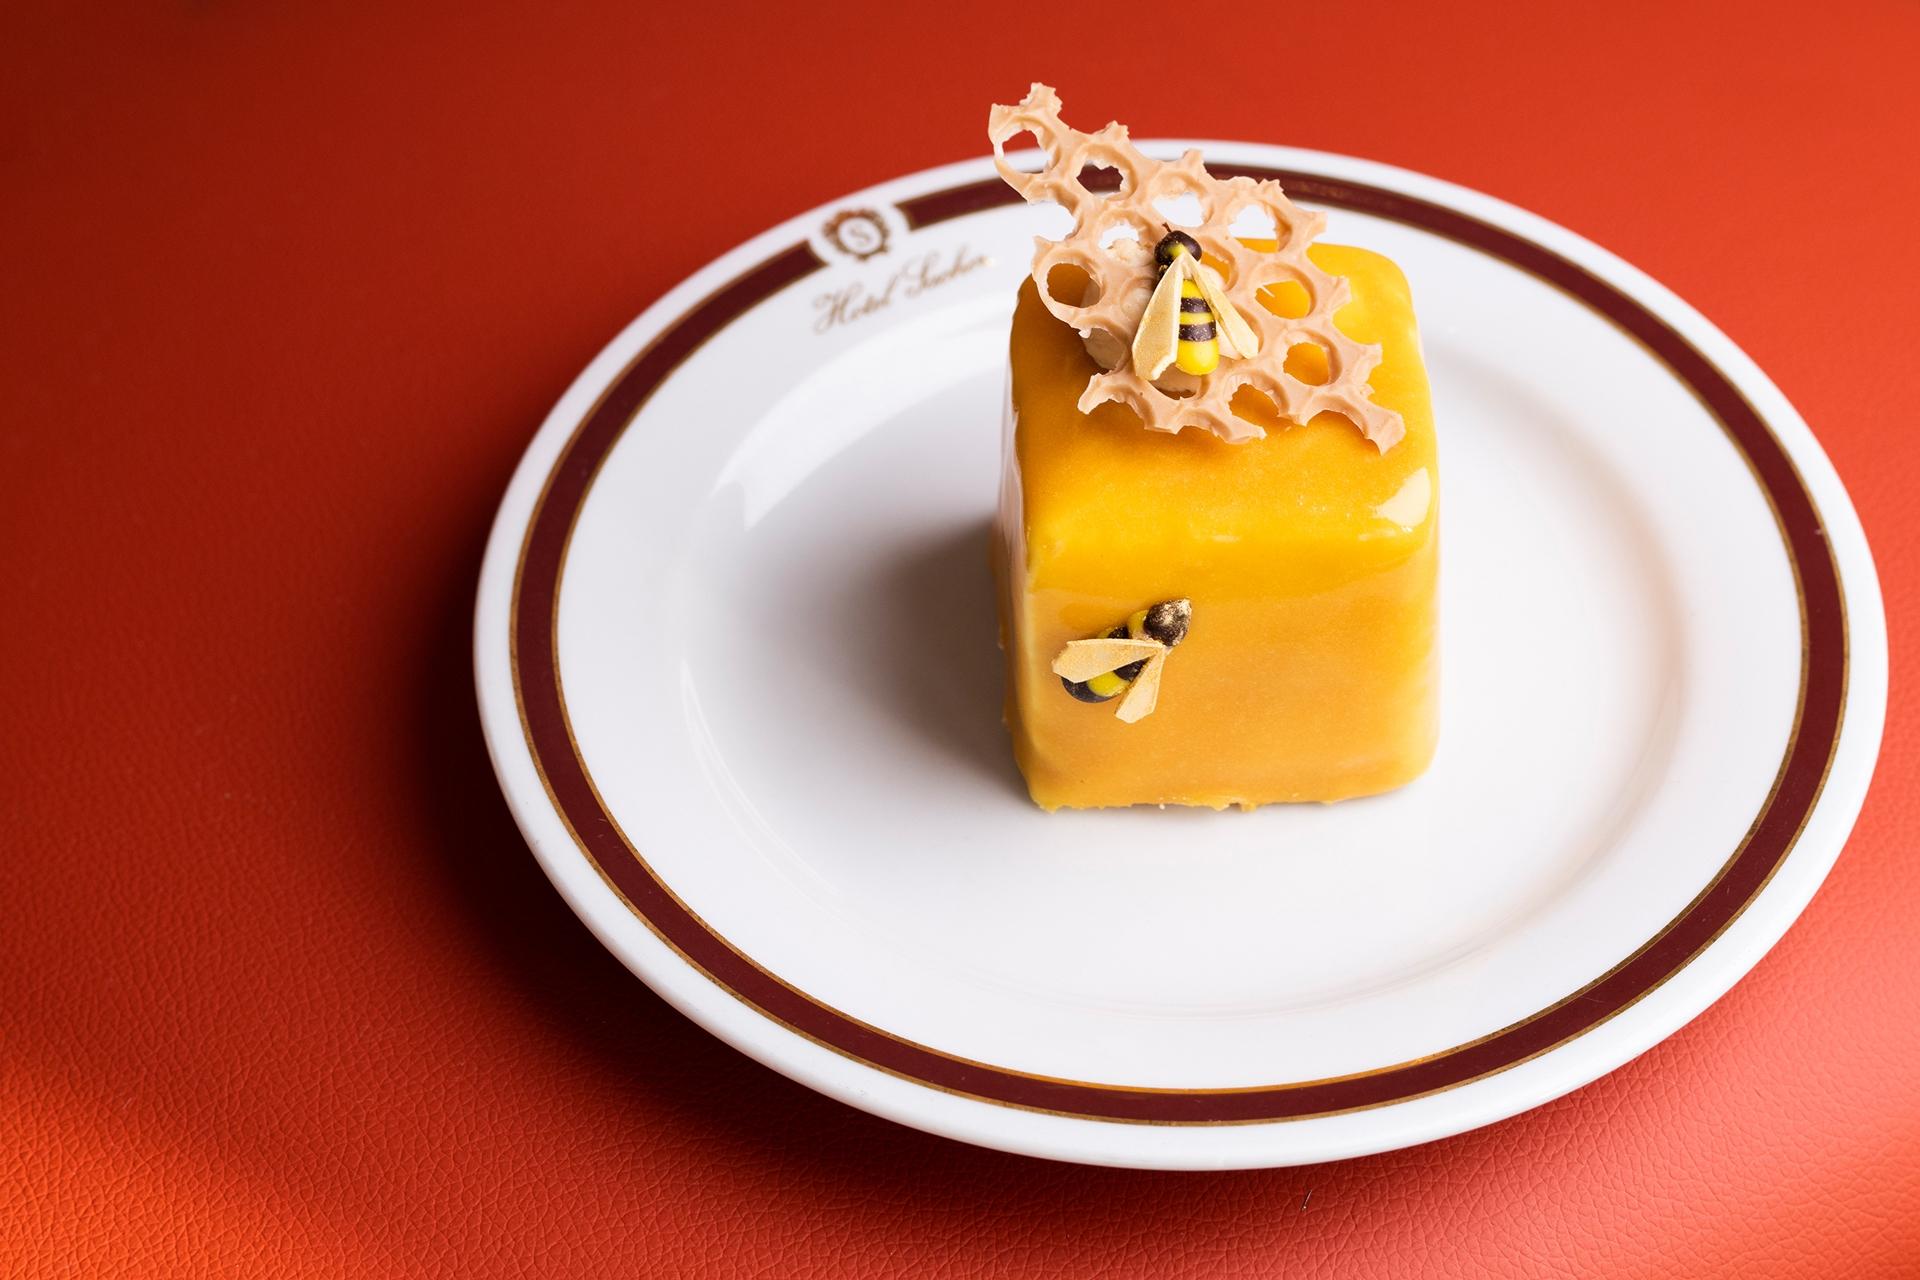 © Eat & Meet, Marco Riebler- Bienenkönigin Hotel Sacher